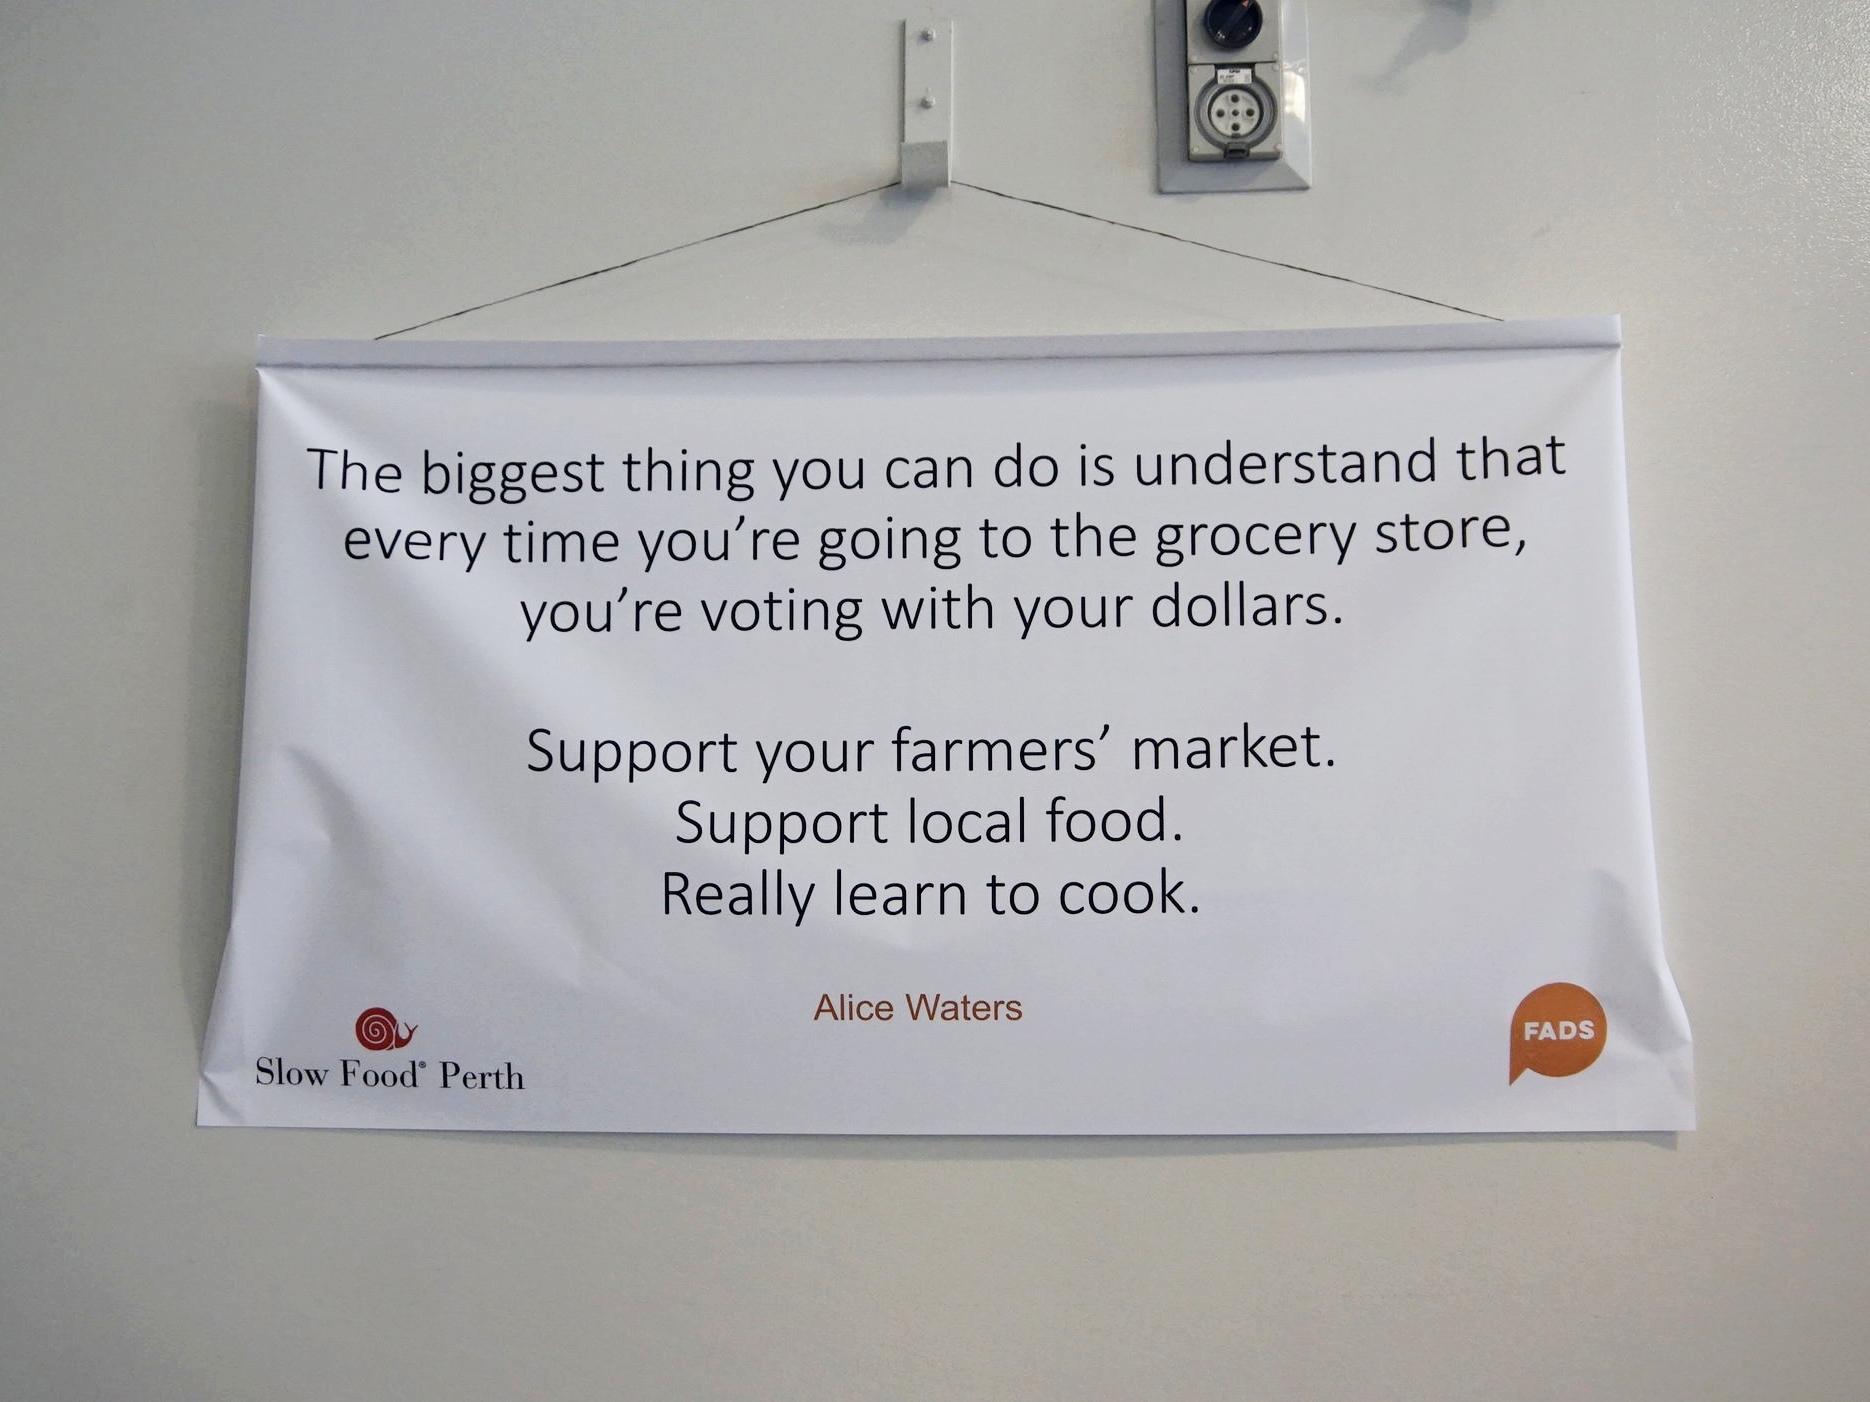 Slow Food Perth WAFADS